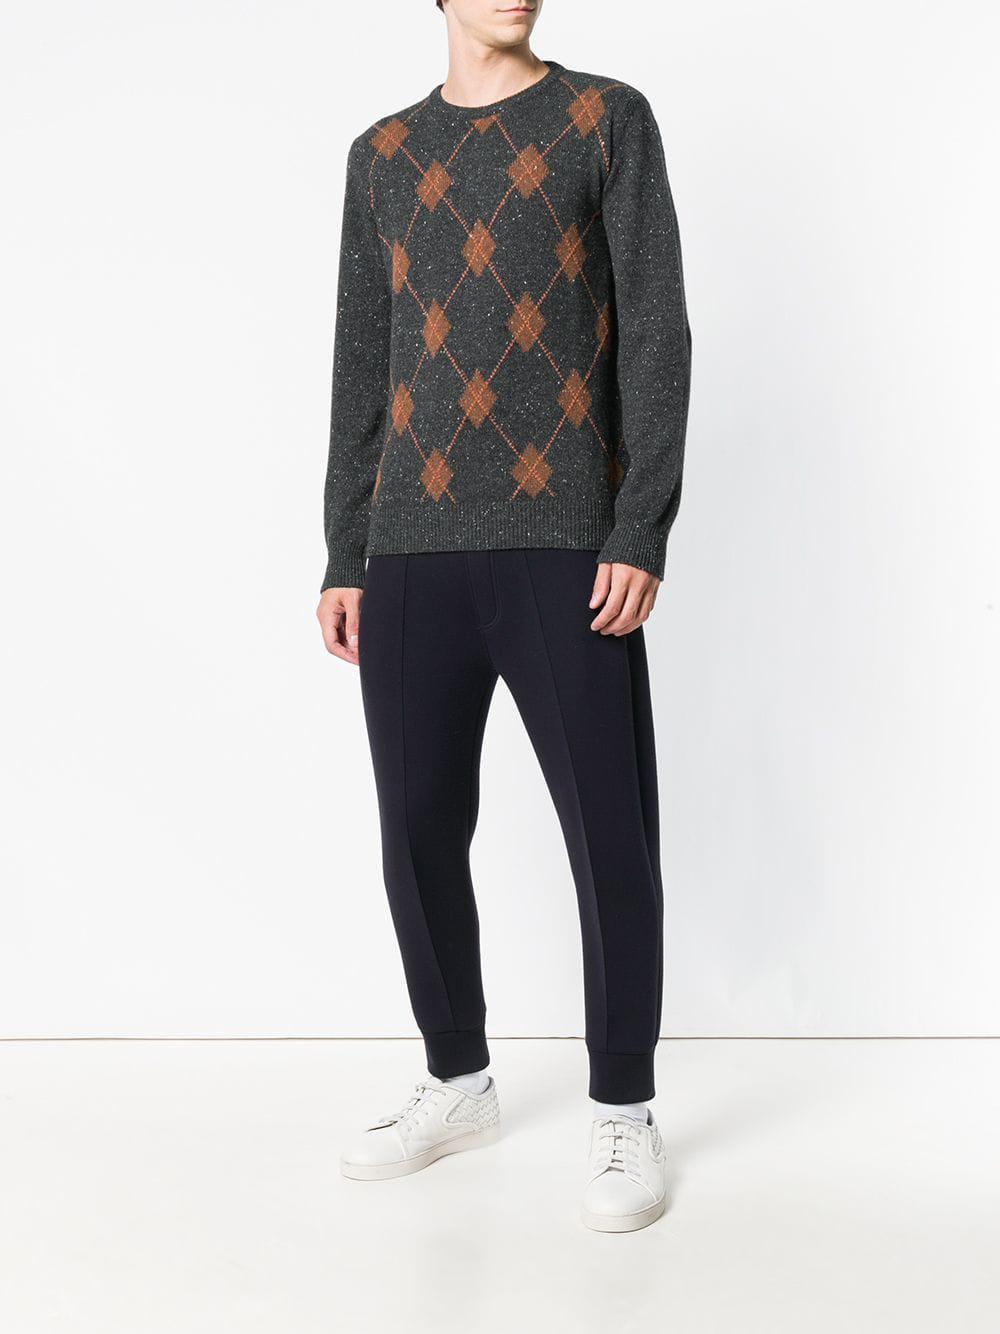 b8416f94e Lyst - Eleventy Cashmere Argyle Pattern Sweater in Black for Men